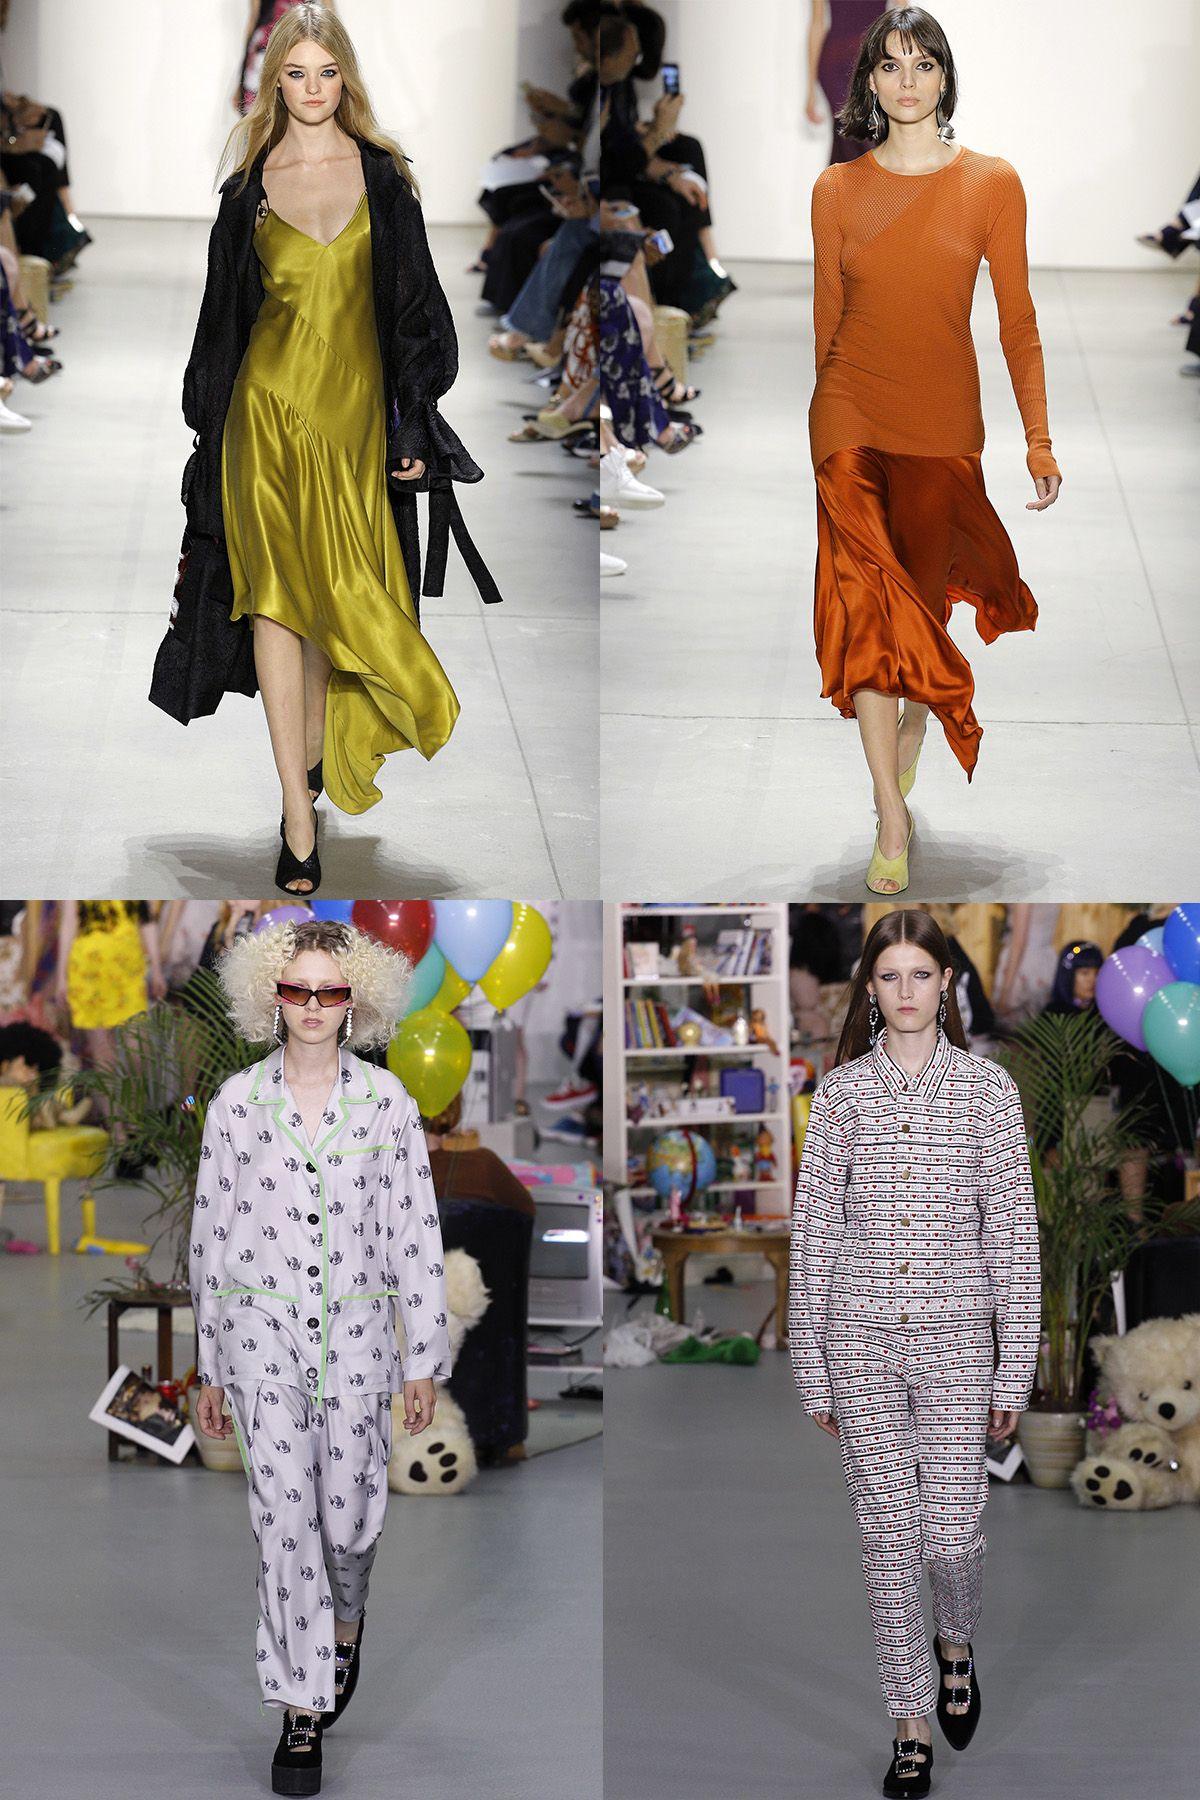 OOTD Inspiration. Intip Yuk Tren Memakai Sleepwear Untuk Gaya Sehari-hari